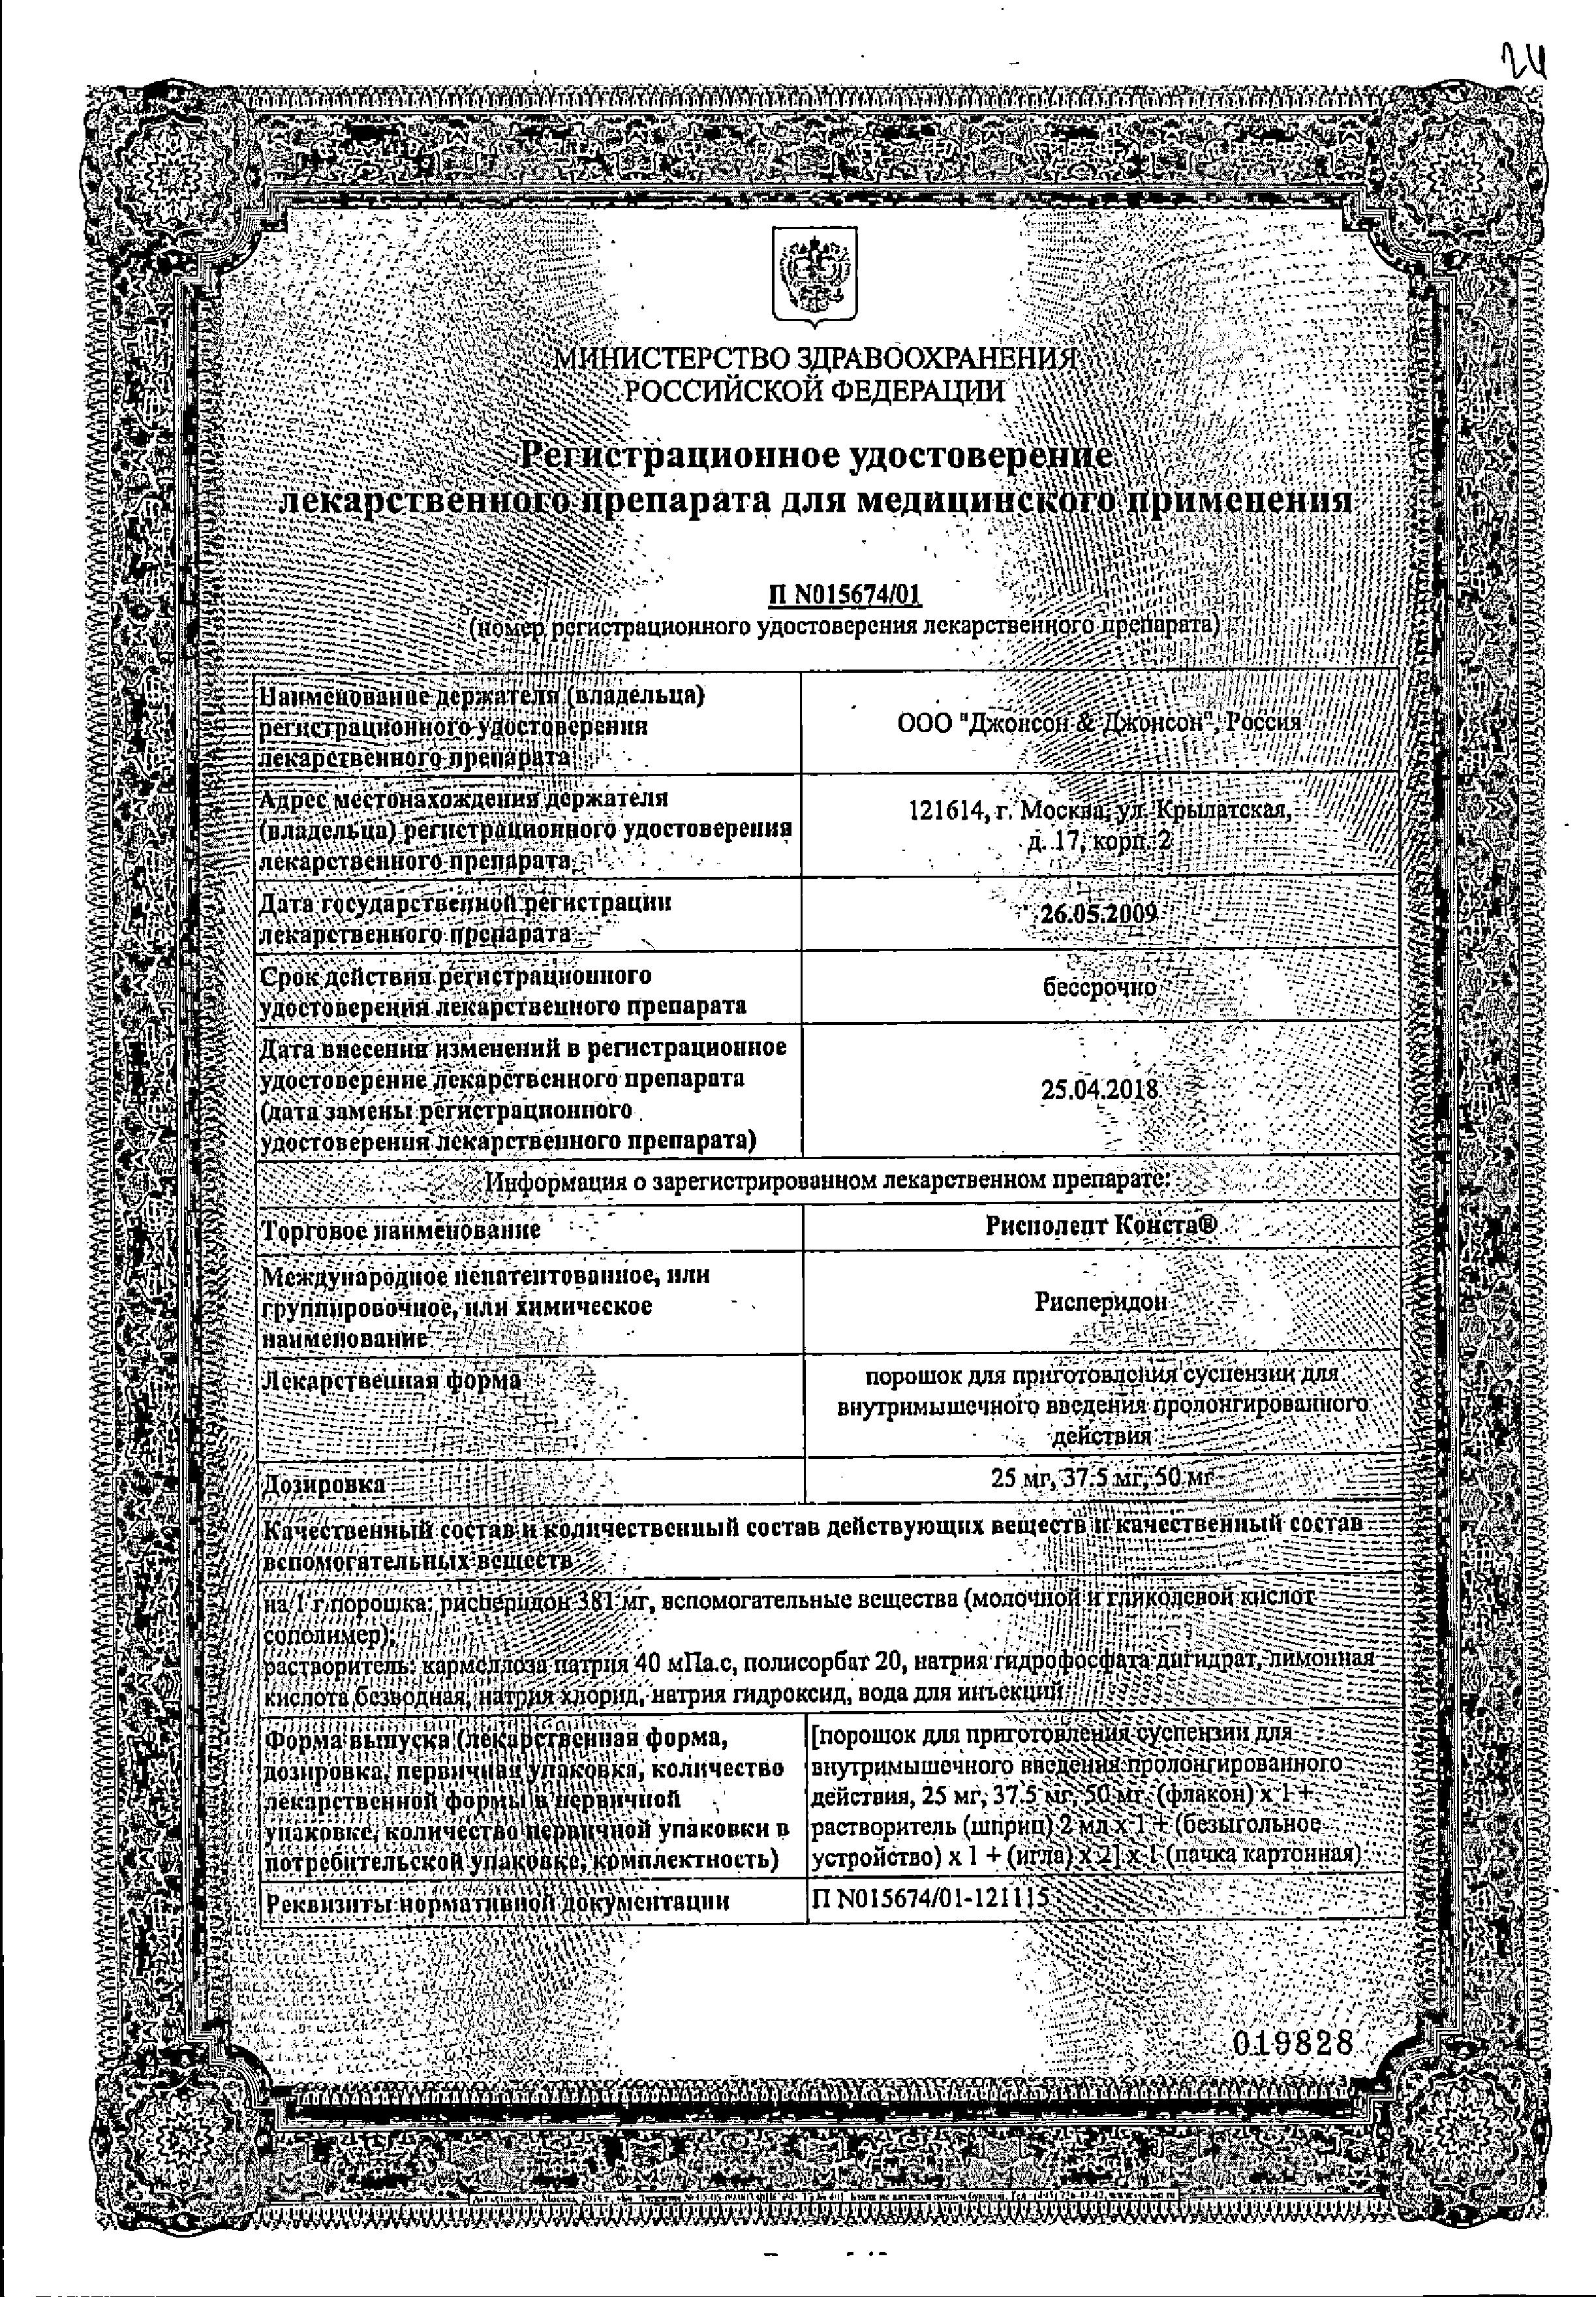 Рисполепт Конста сертификат